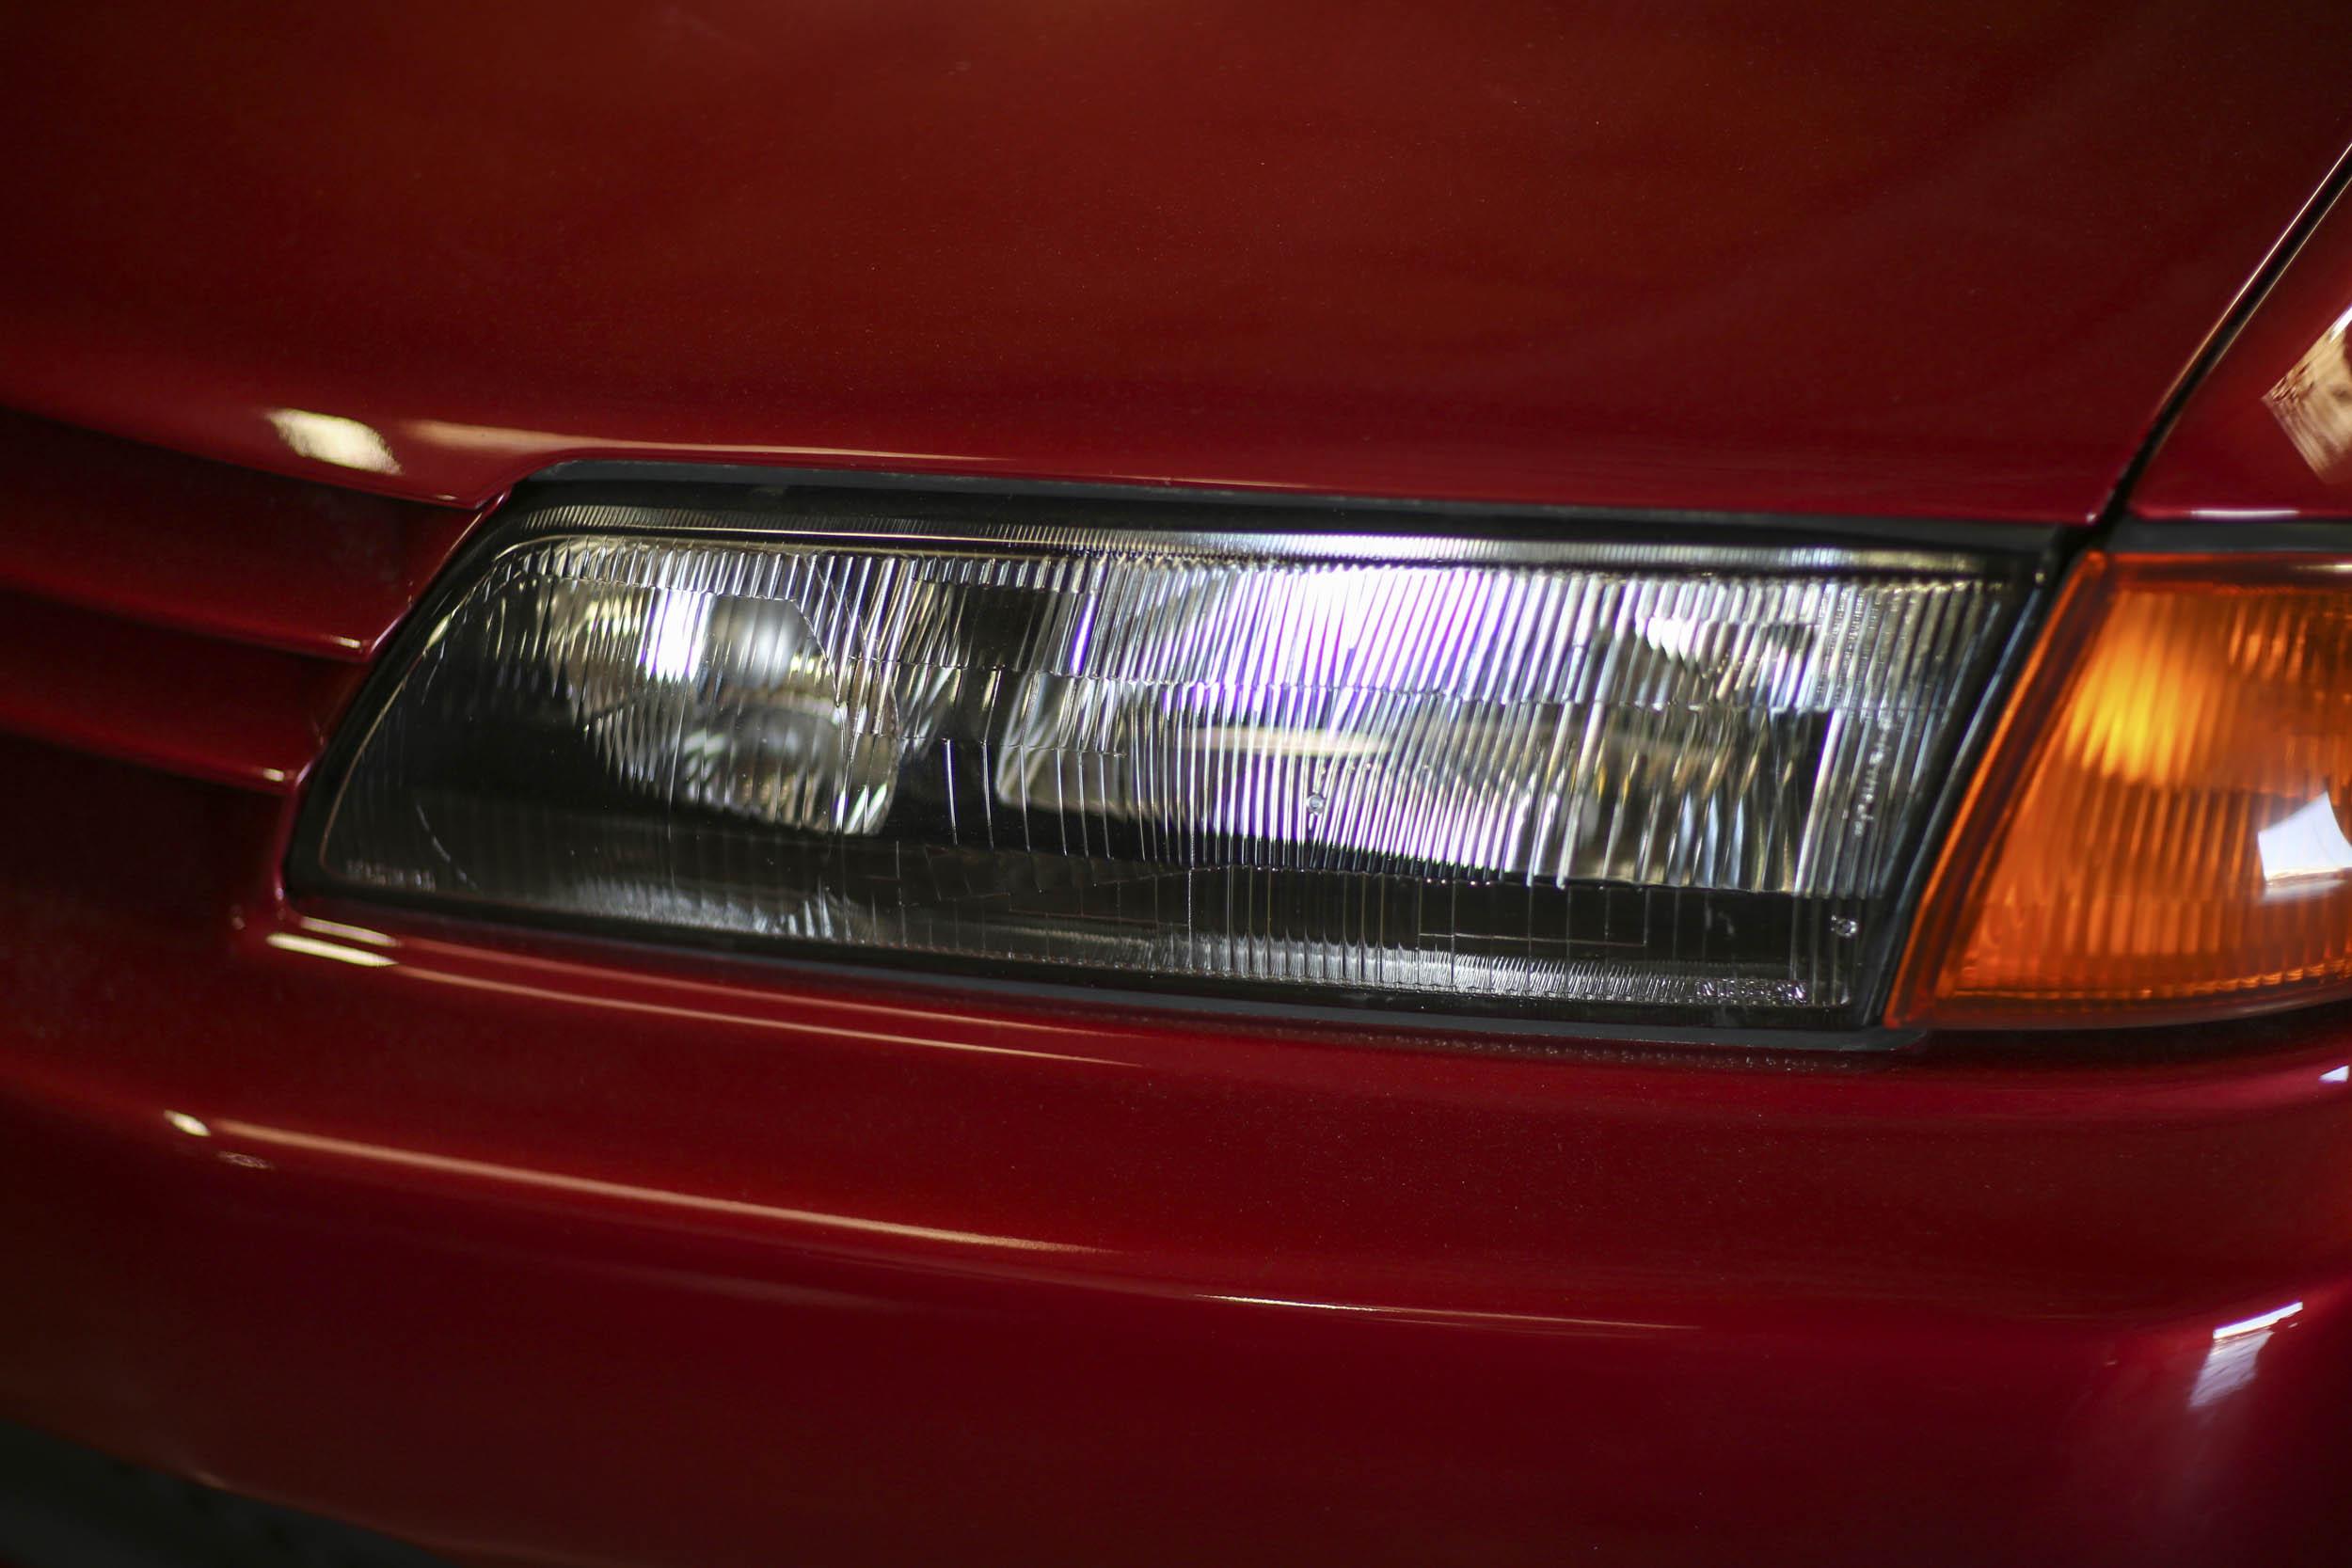 Nissan R32 GT-R headlights